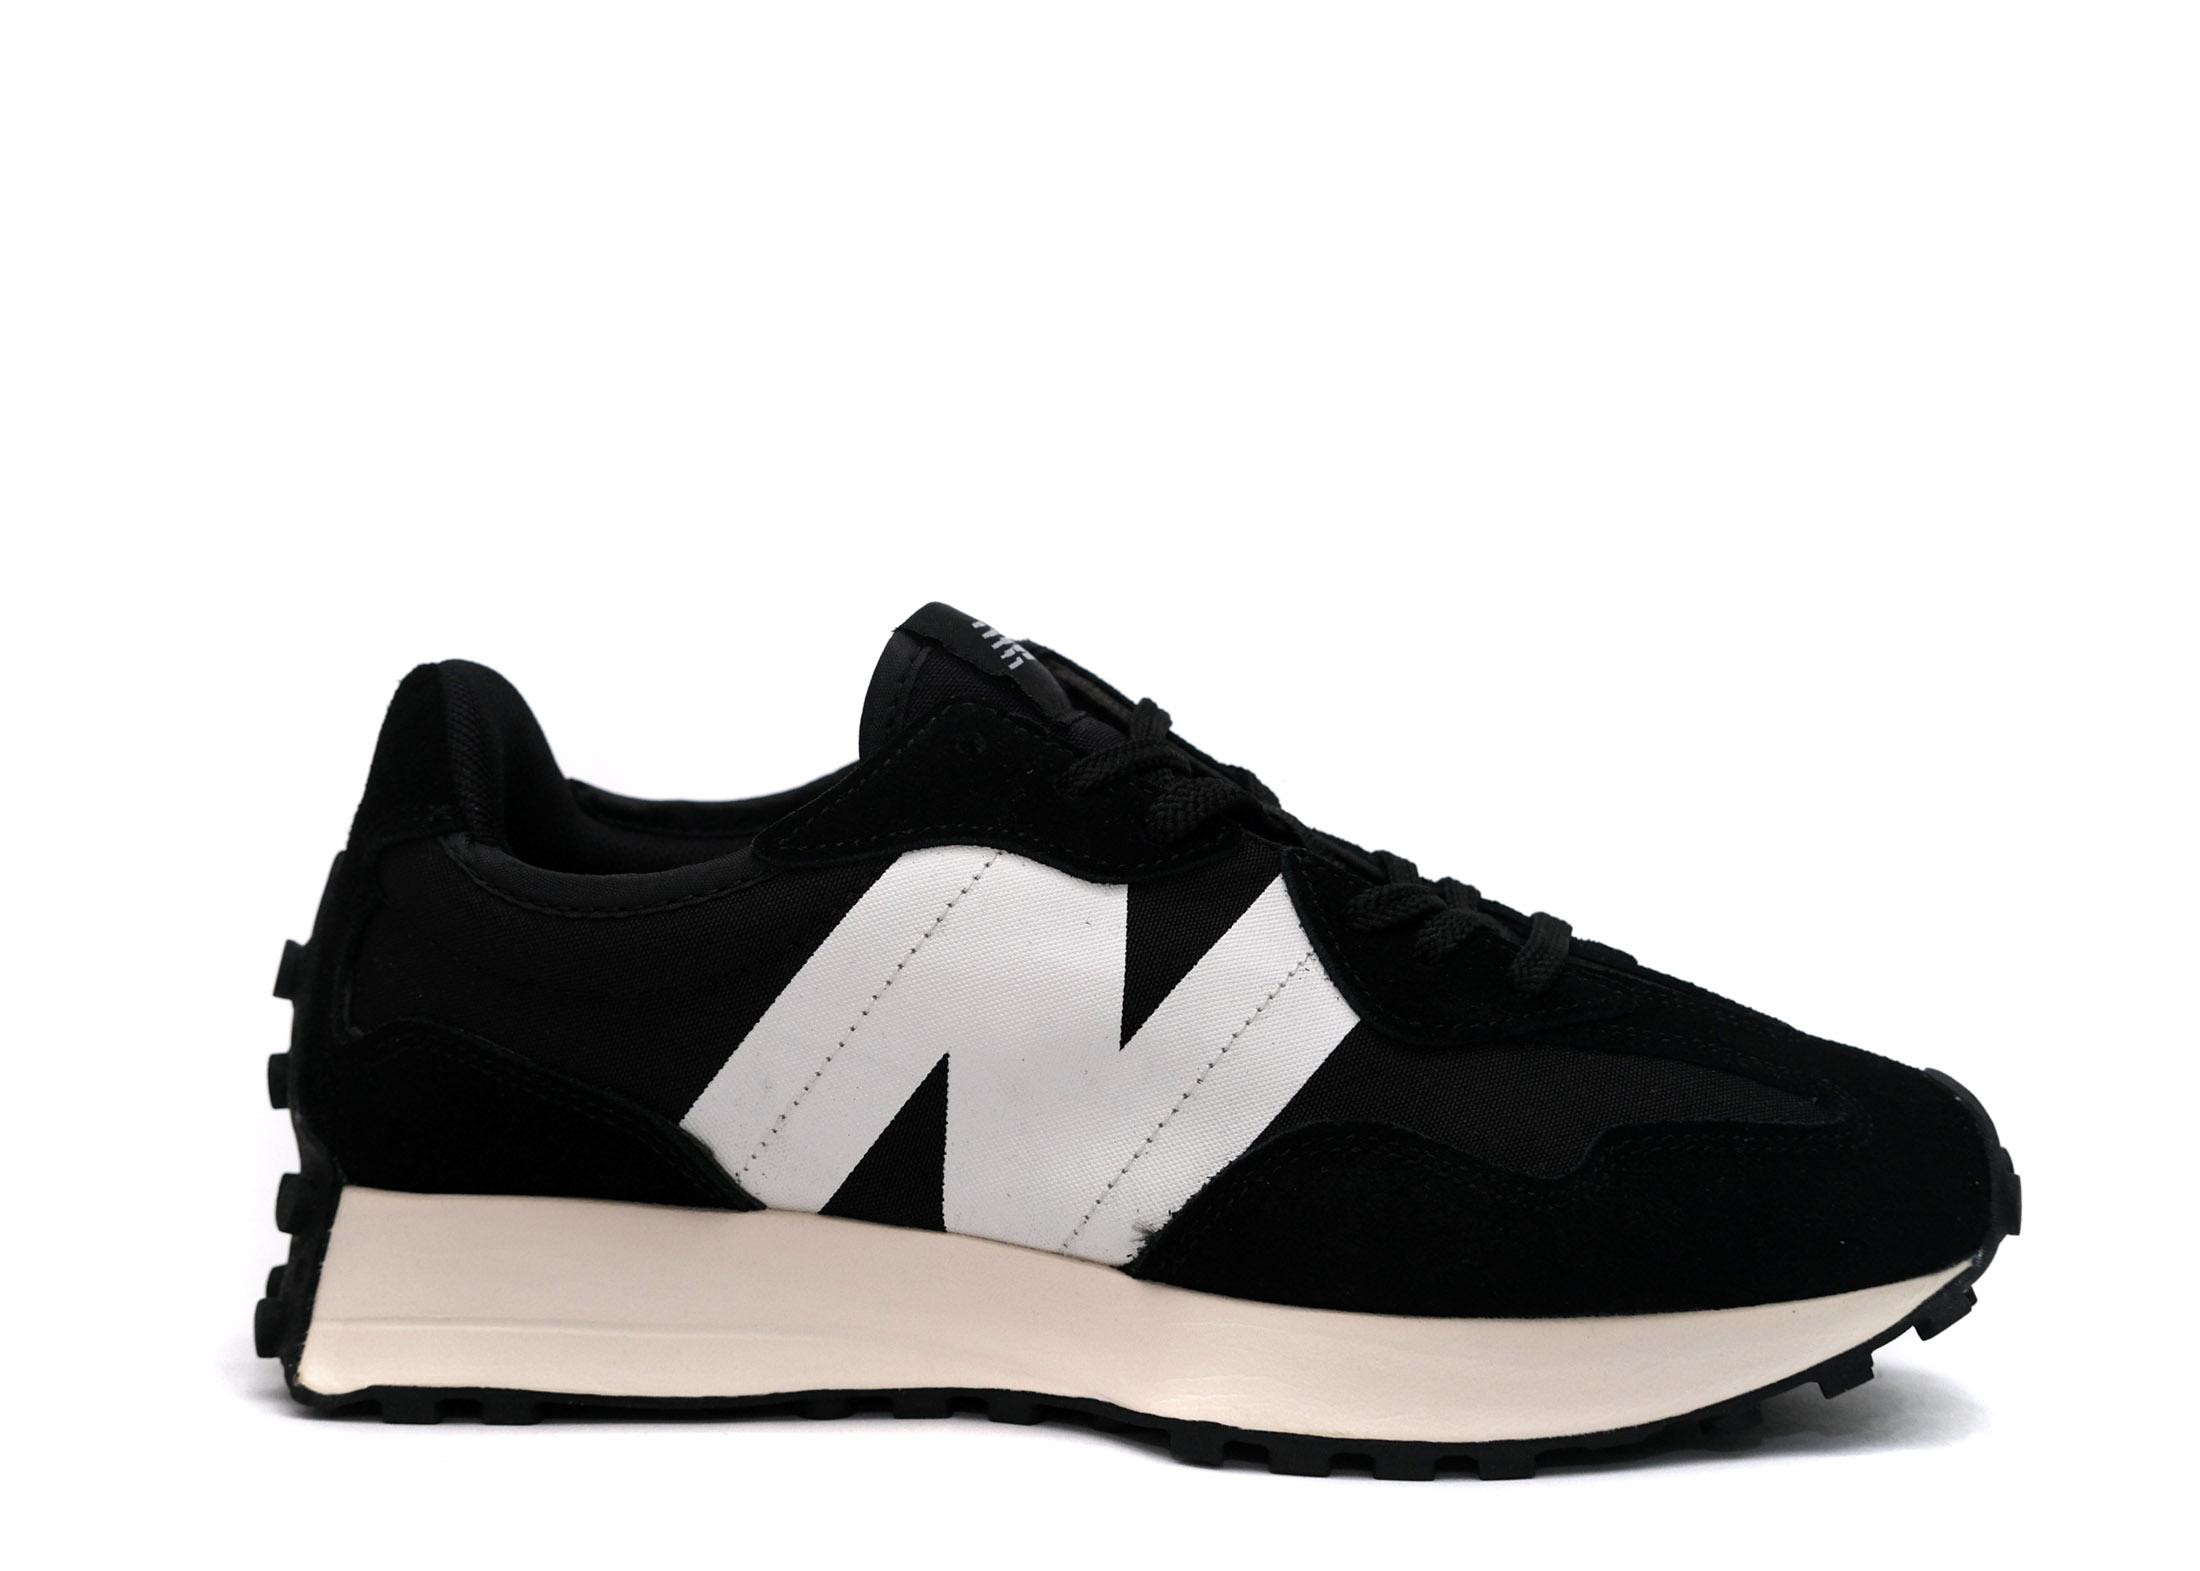 New Balance Wmns 327 'Black White